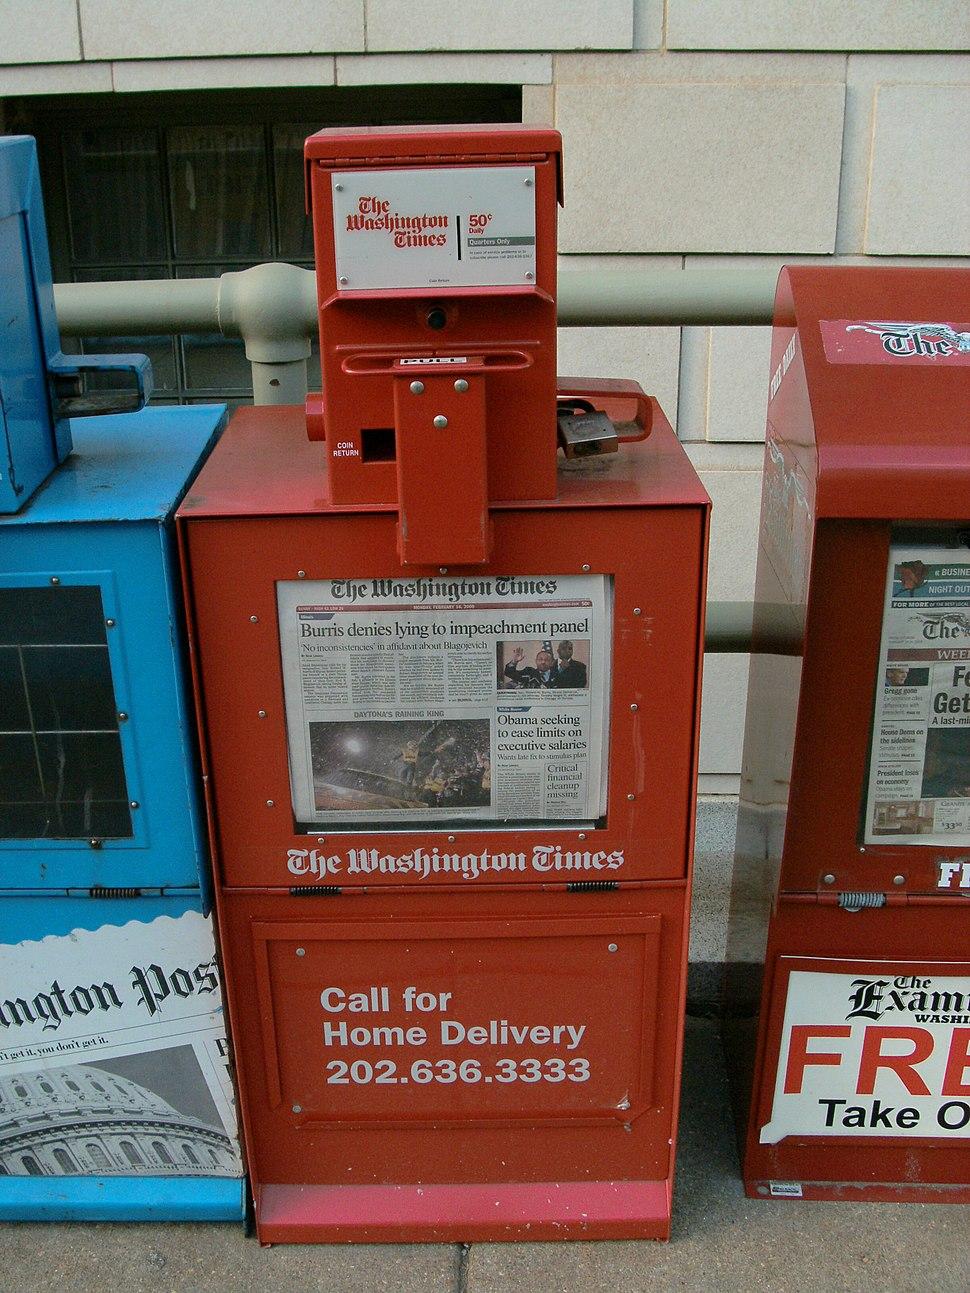 Washington Times dispenser